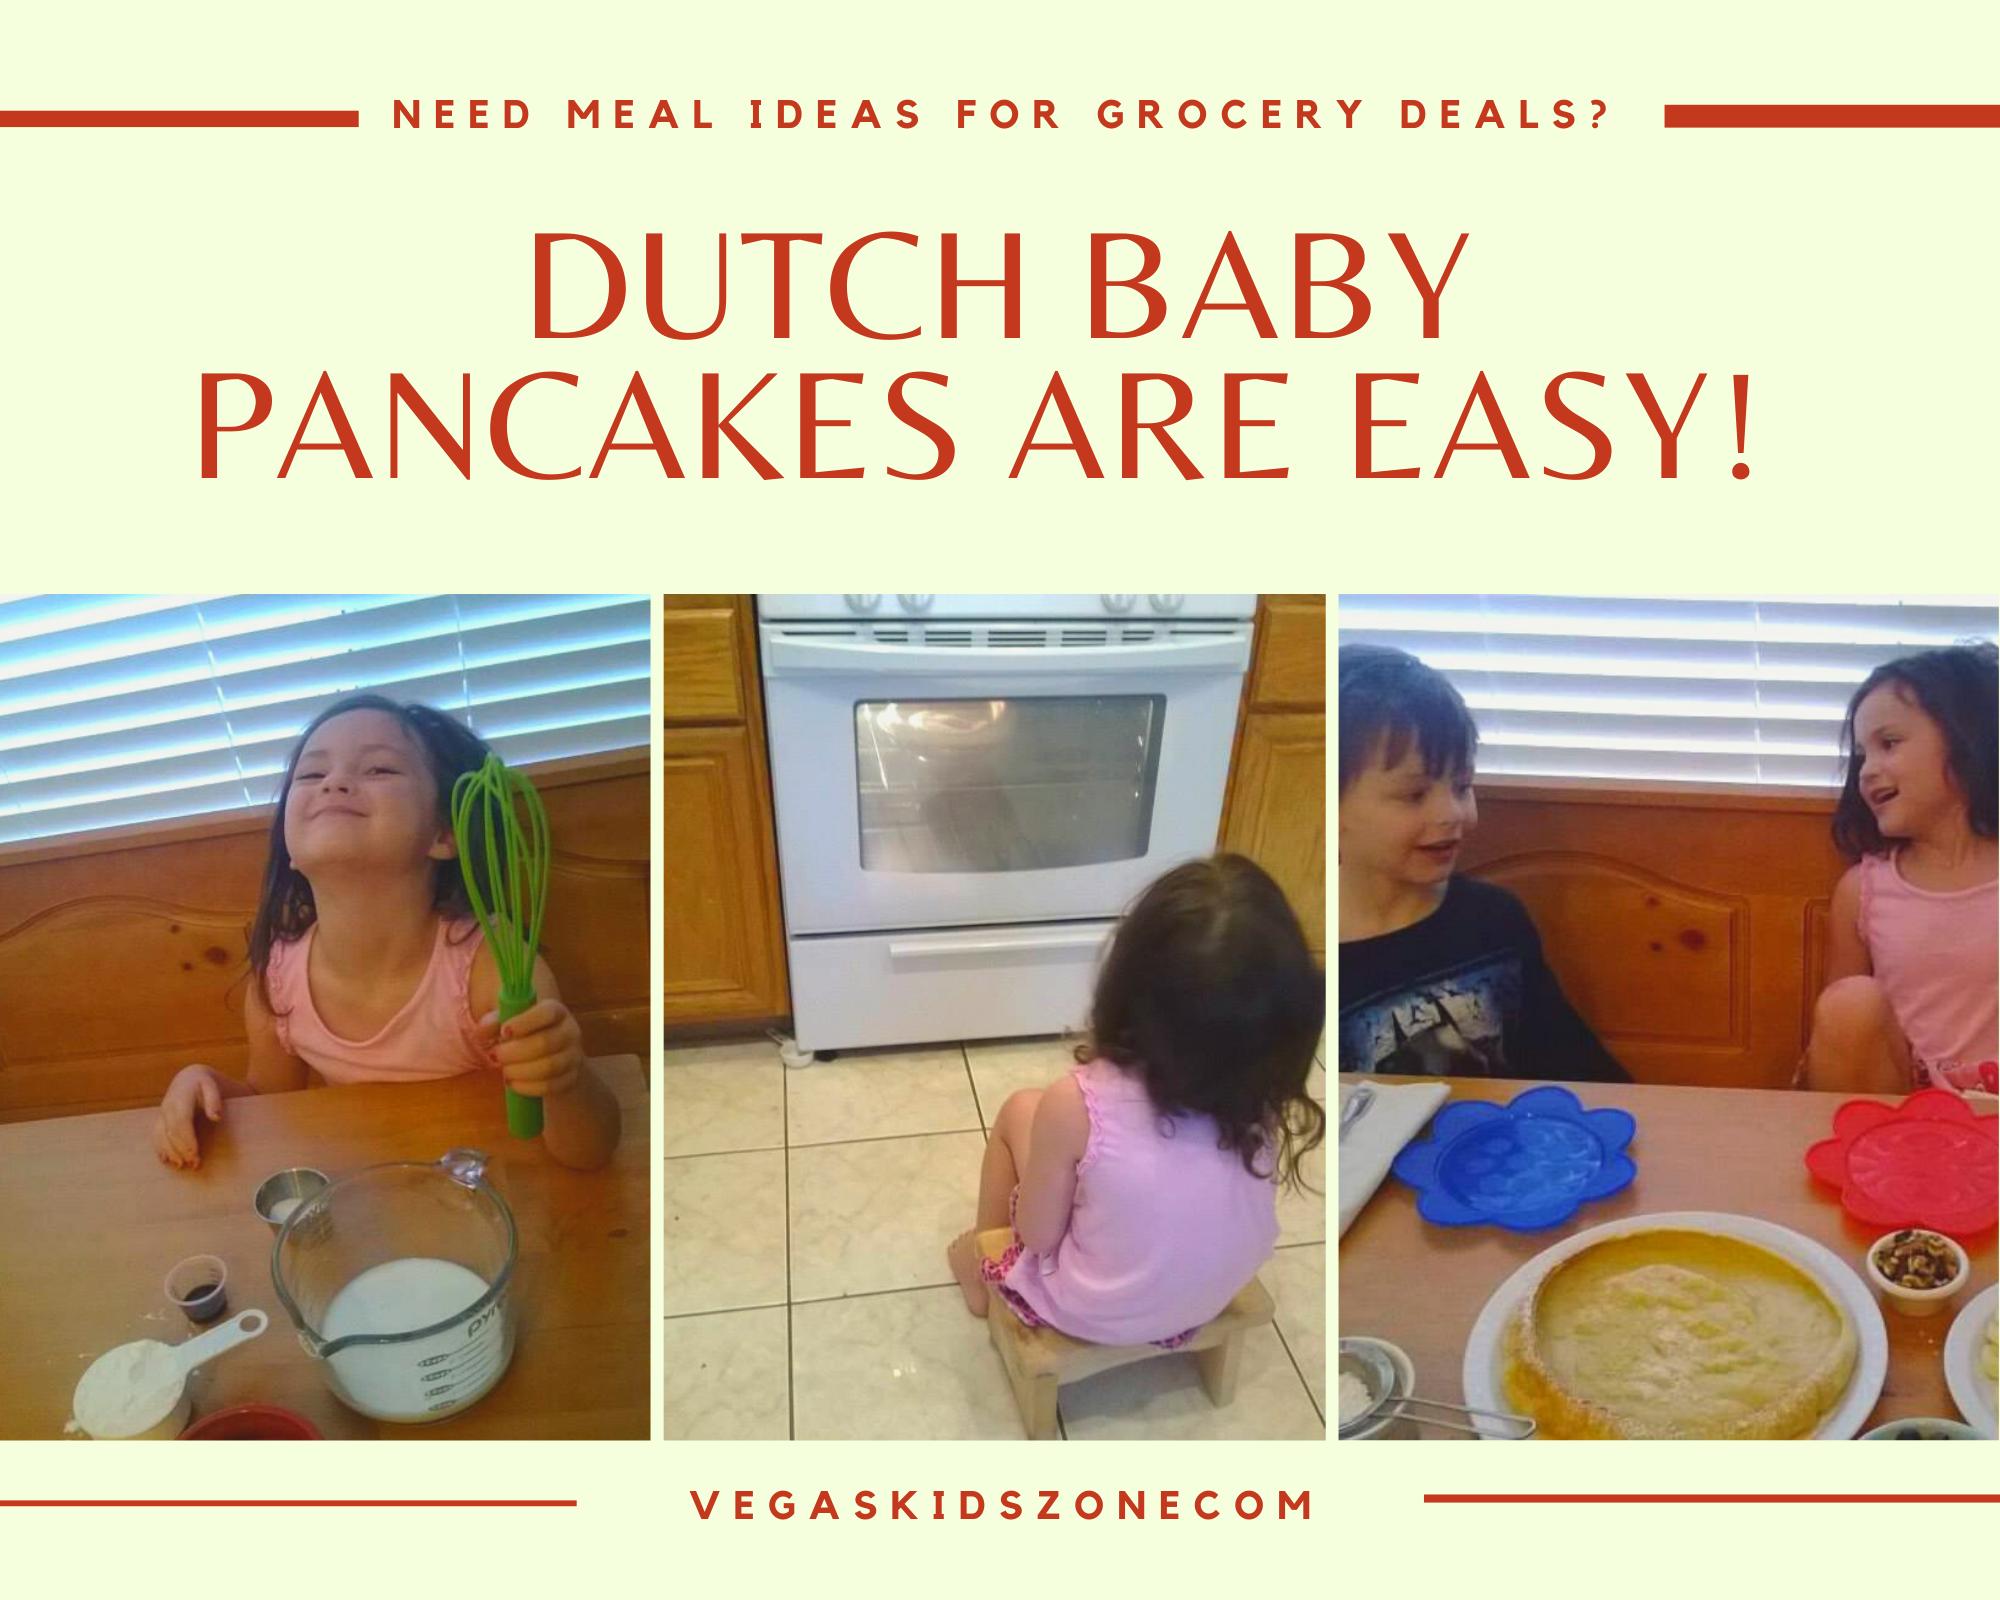 Kids can whip up a beautiful Dutch baby pancake.